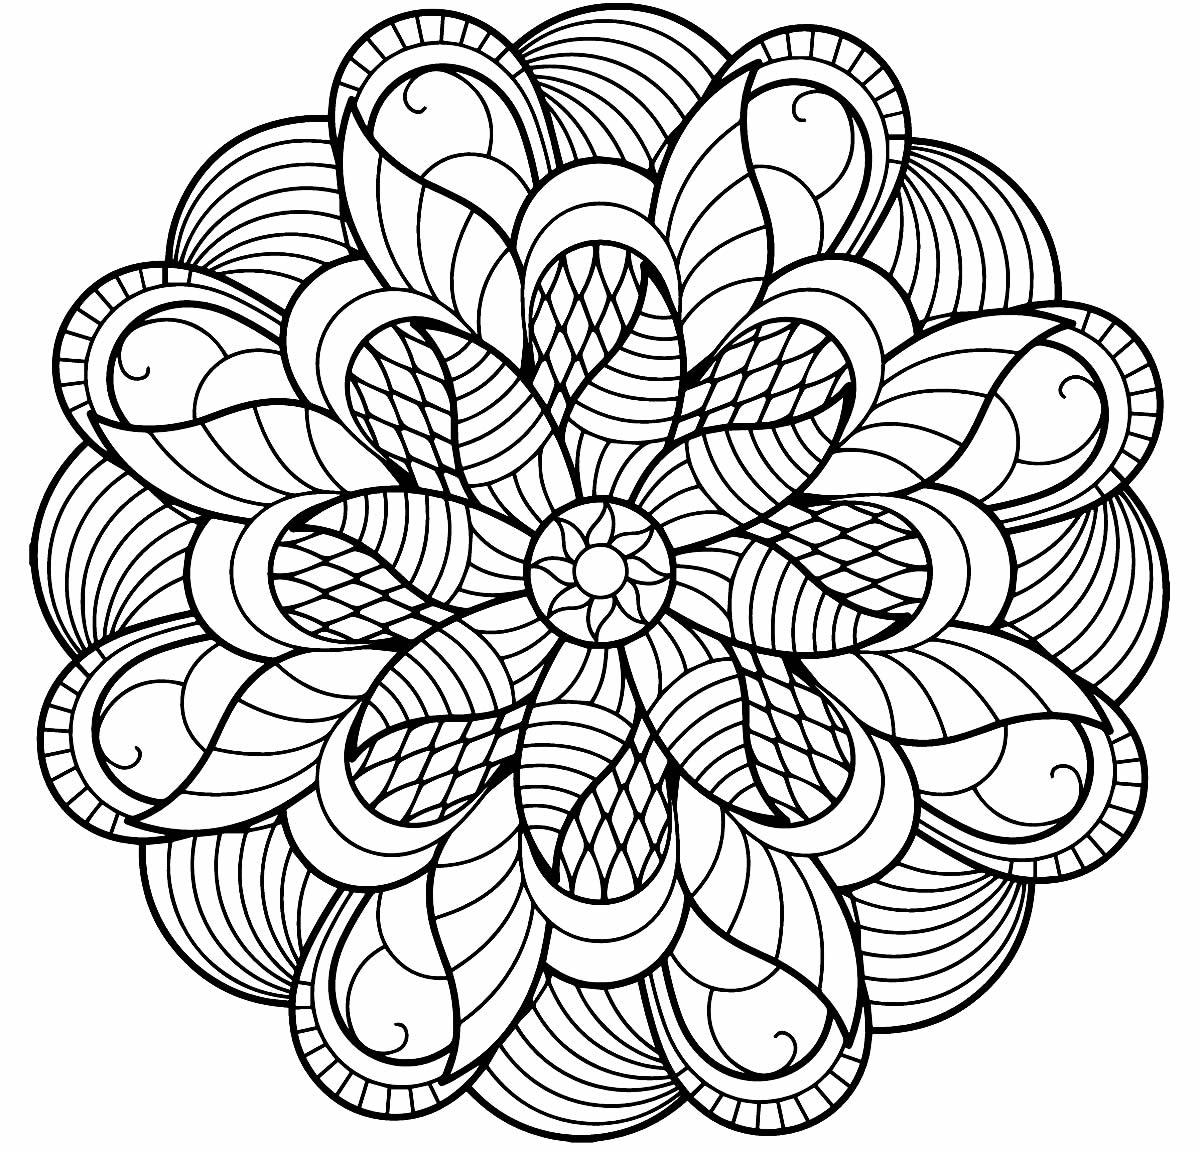 Mandala créatif à peindre